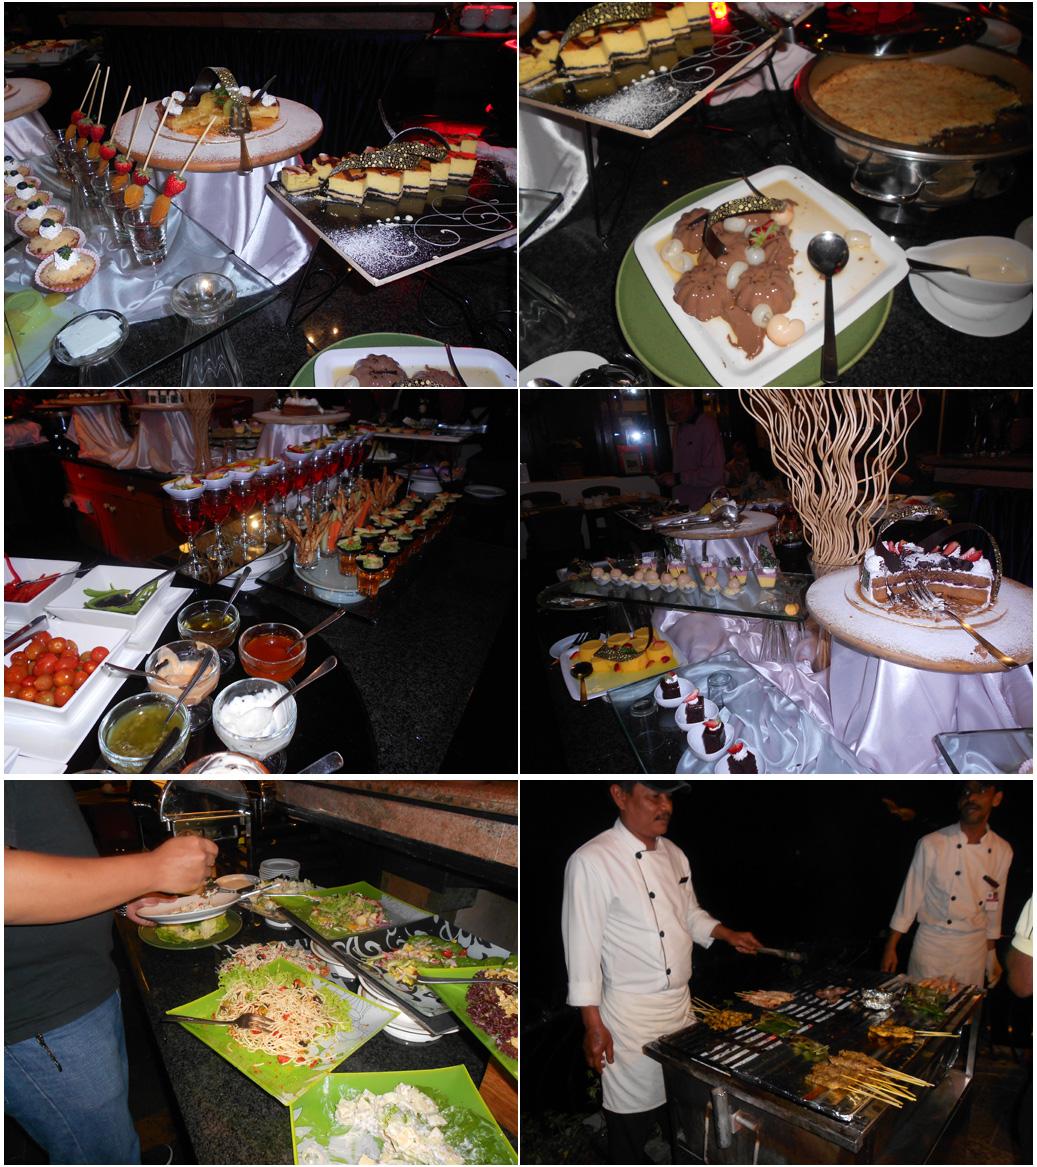 Makan malam di Strawberry Park Resort, Cameron Highlands